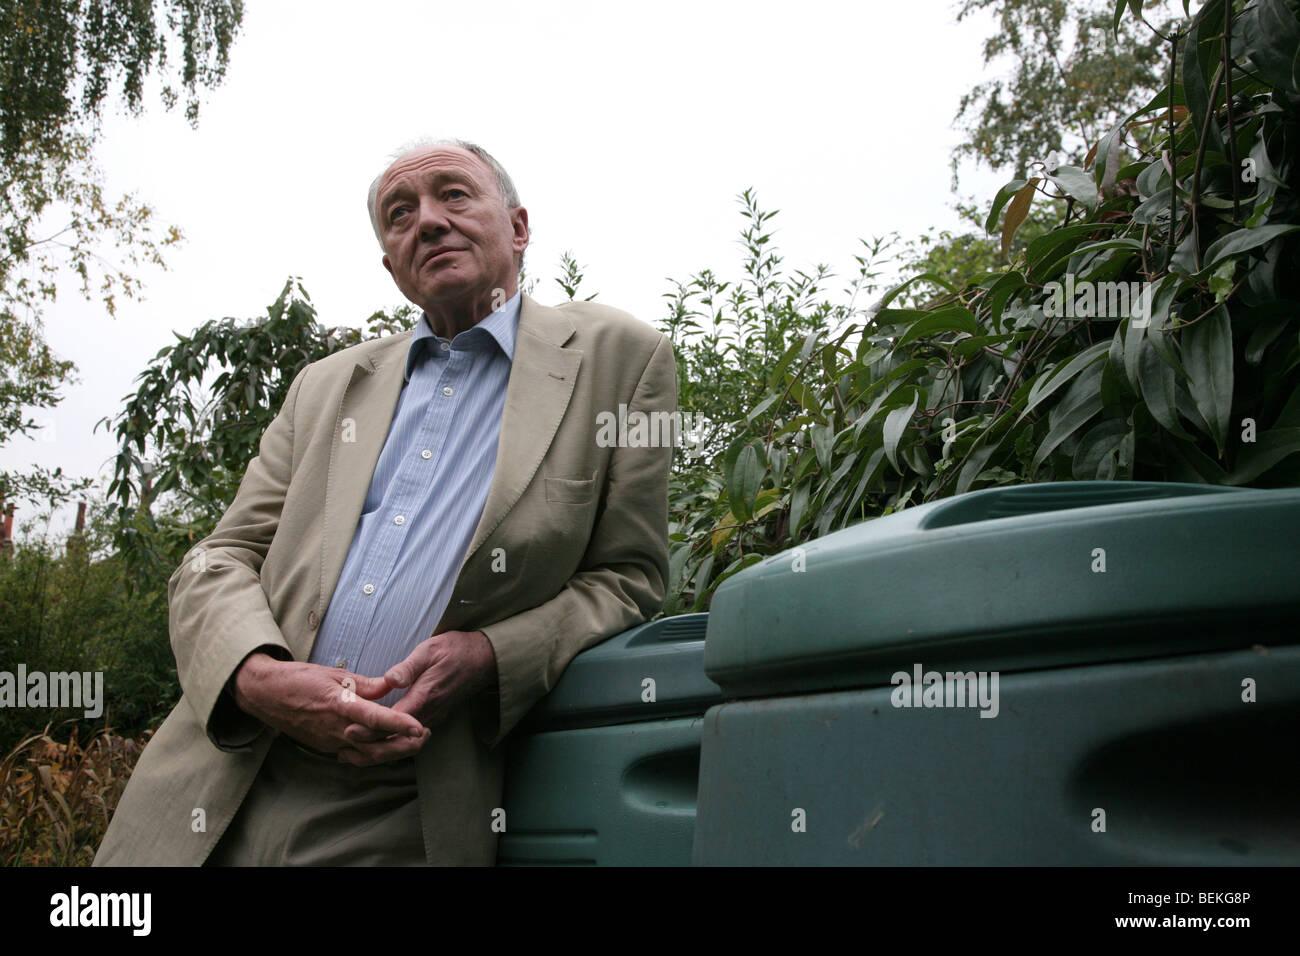 Former Mayor of London Ken Livingstone at home in north London , UK. - Stock Image